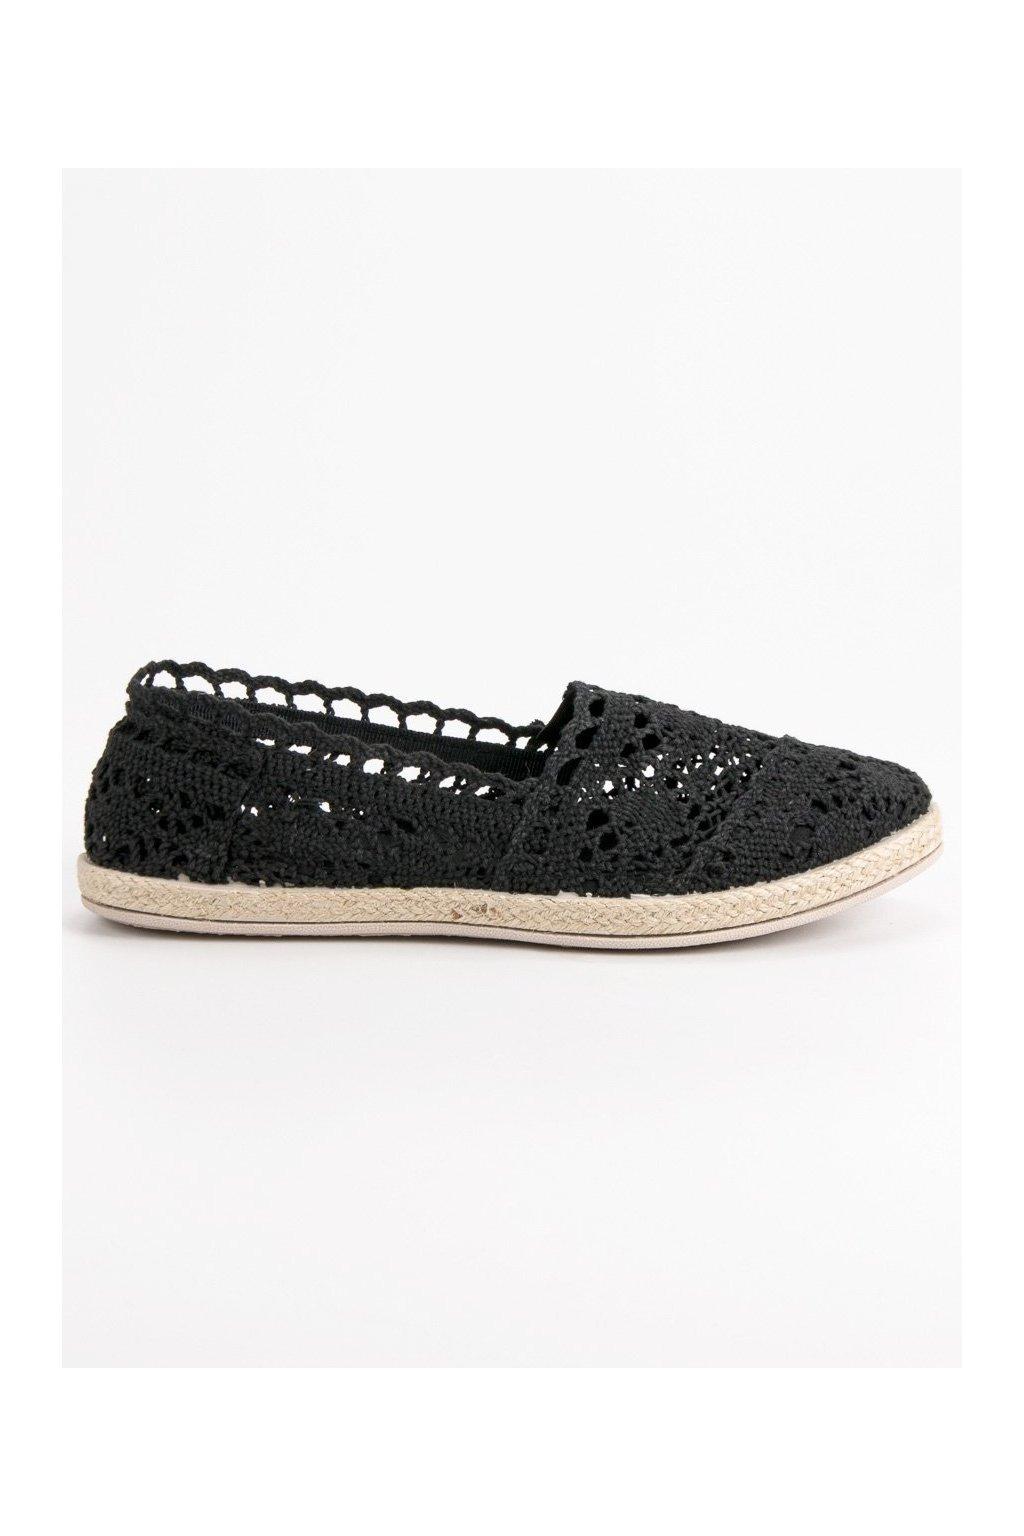 166a36b0d72f 1053945-1 cierne-espadrilky-s-krajkou-sweet-shoes.jpg 5c5cbda6